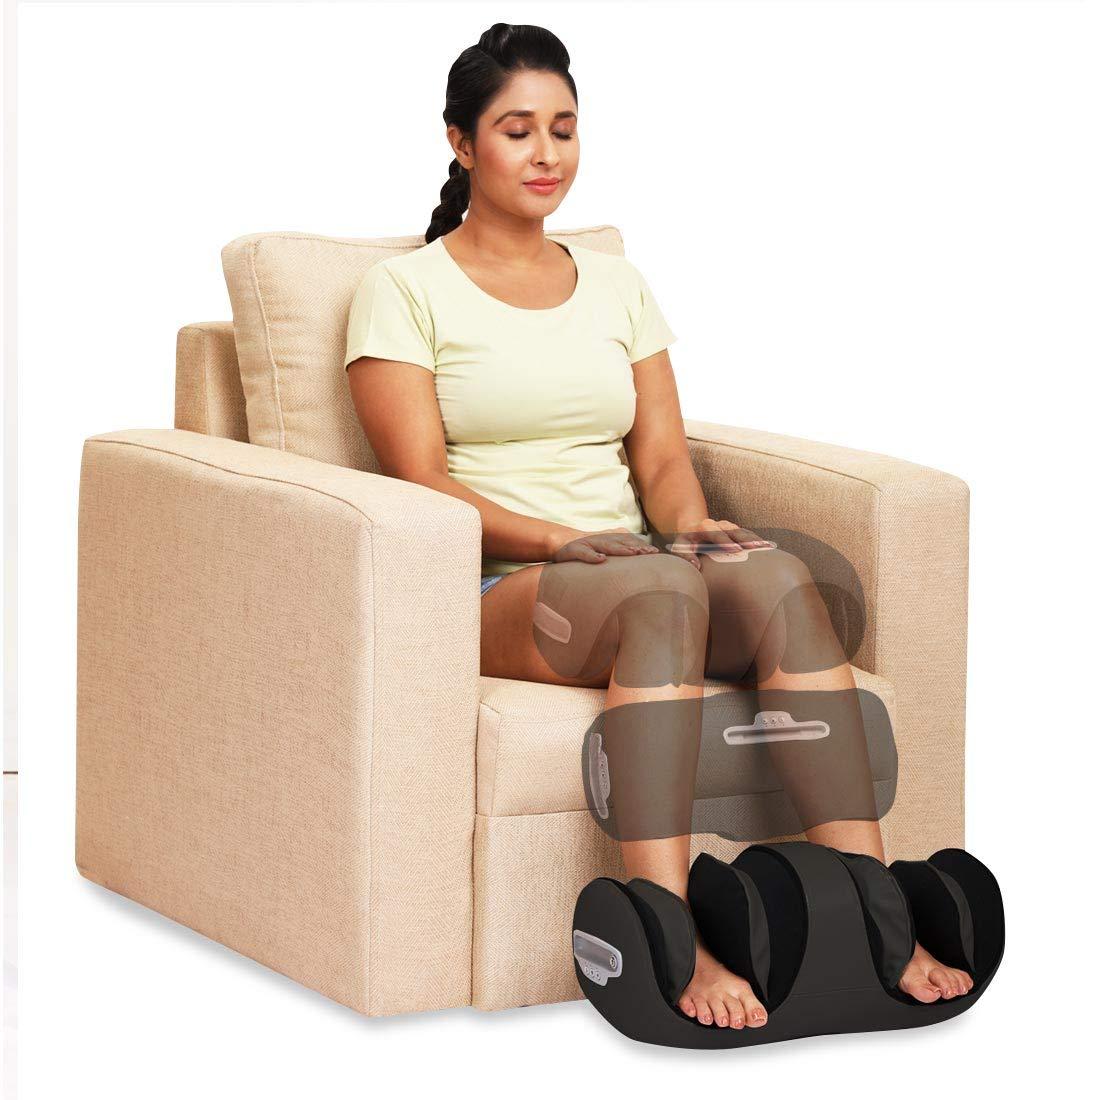 JSB HF156 Wireless Rechargeable Foot Massager Machine